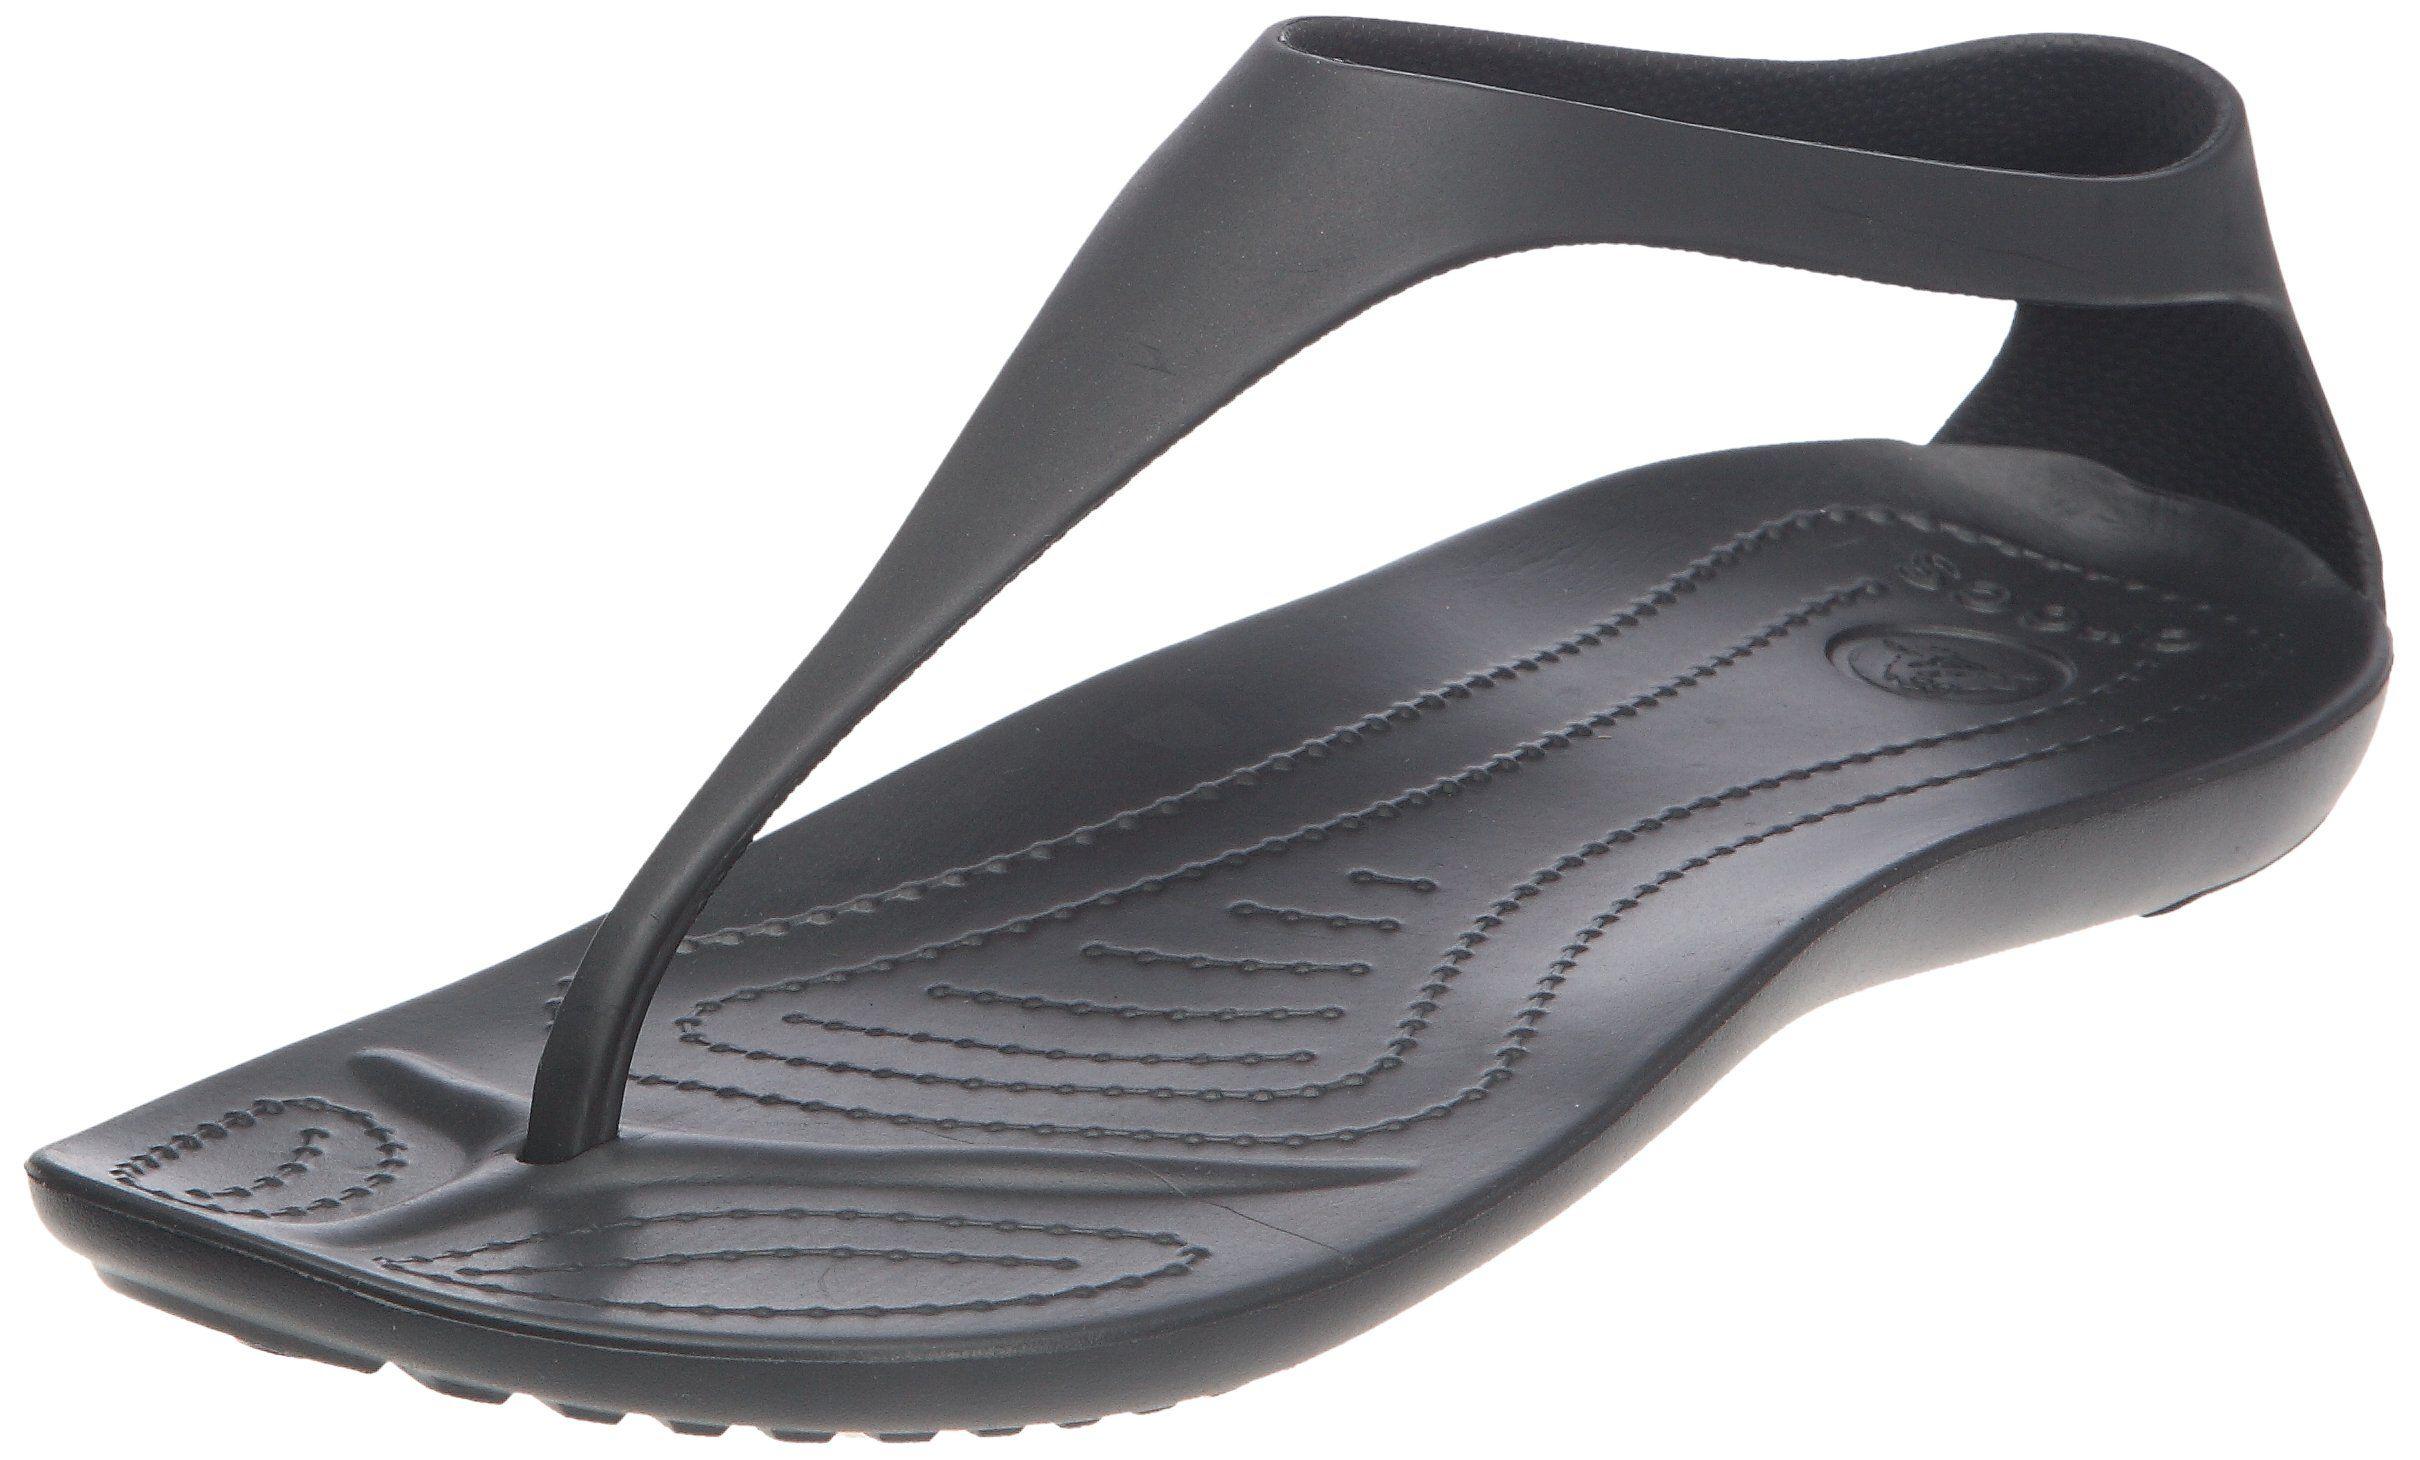 7d6f767283b5 CrocsWomen s Sexi Flip Flops  Amazon.co.uk  Shoes   Bags. Crocs Women s ...